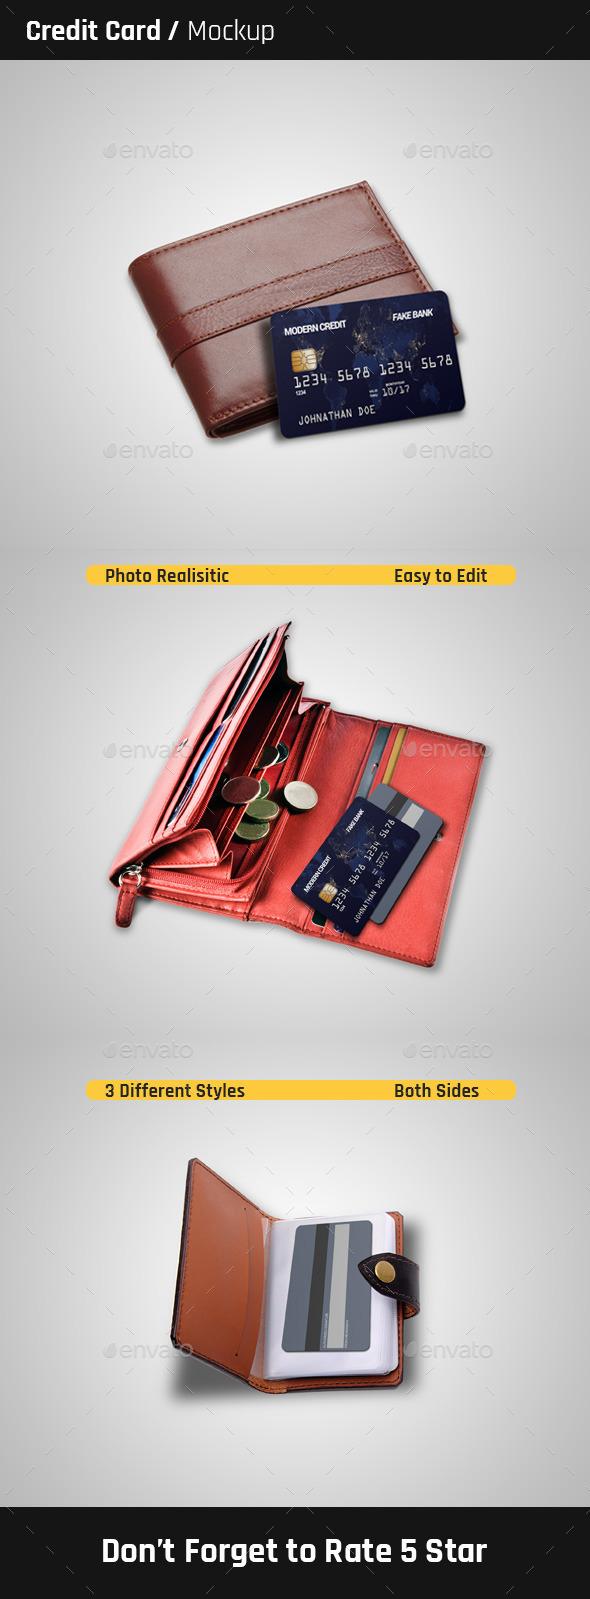 Credit Card Mock-Ups - Print Product Mock-Ups